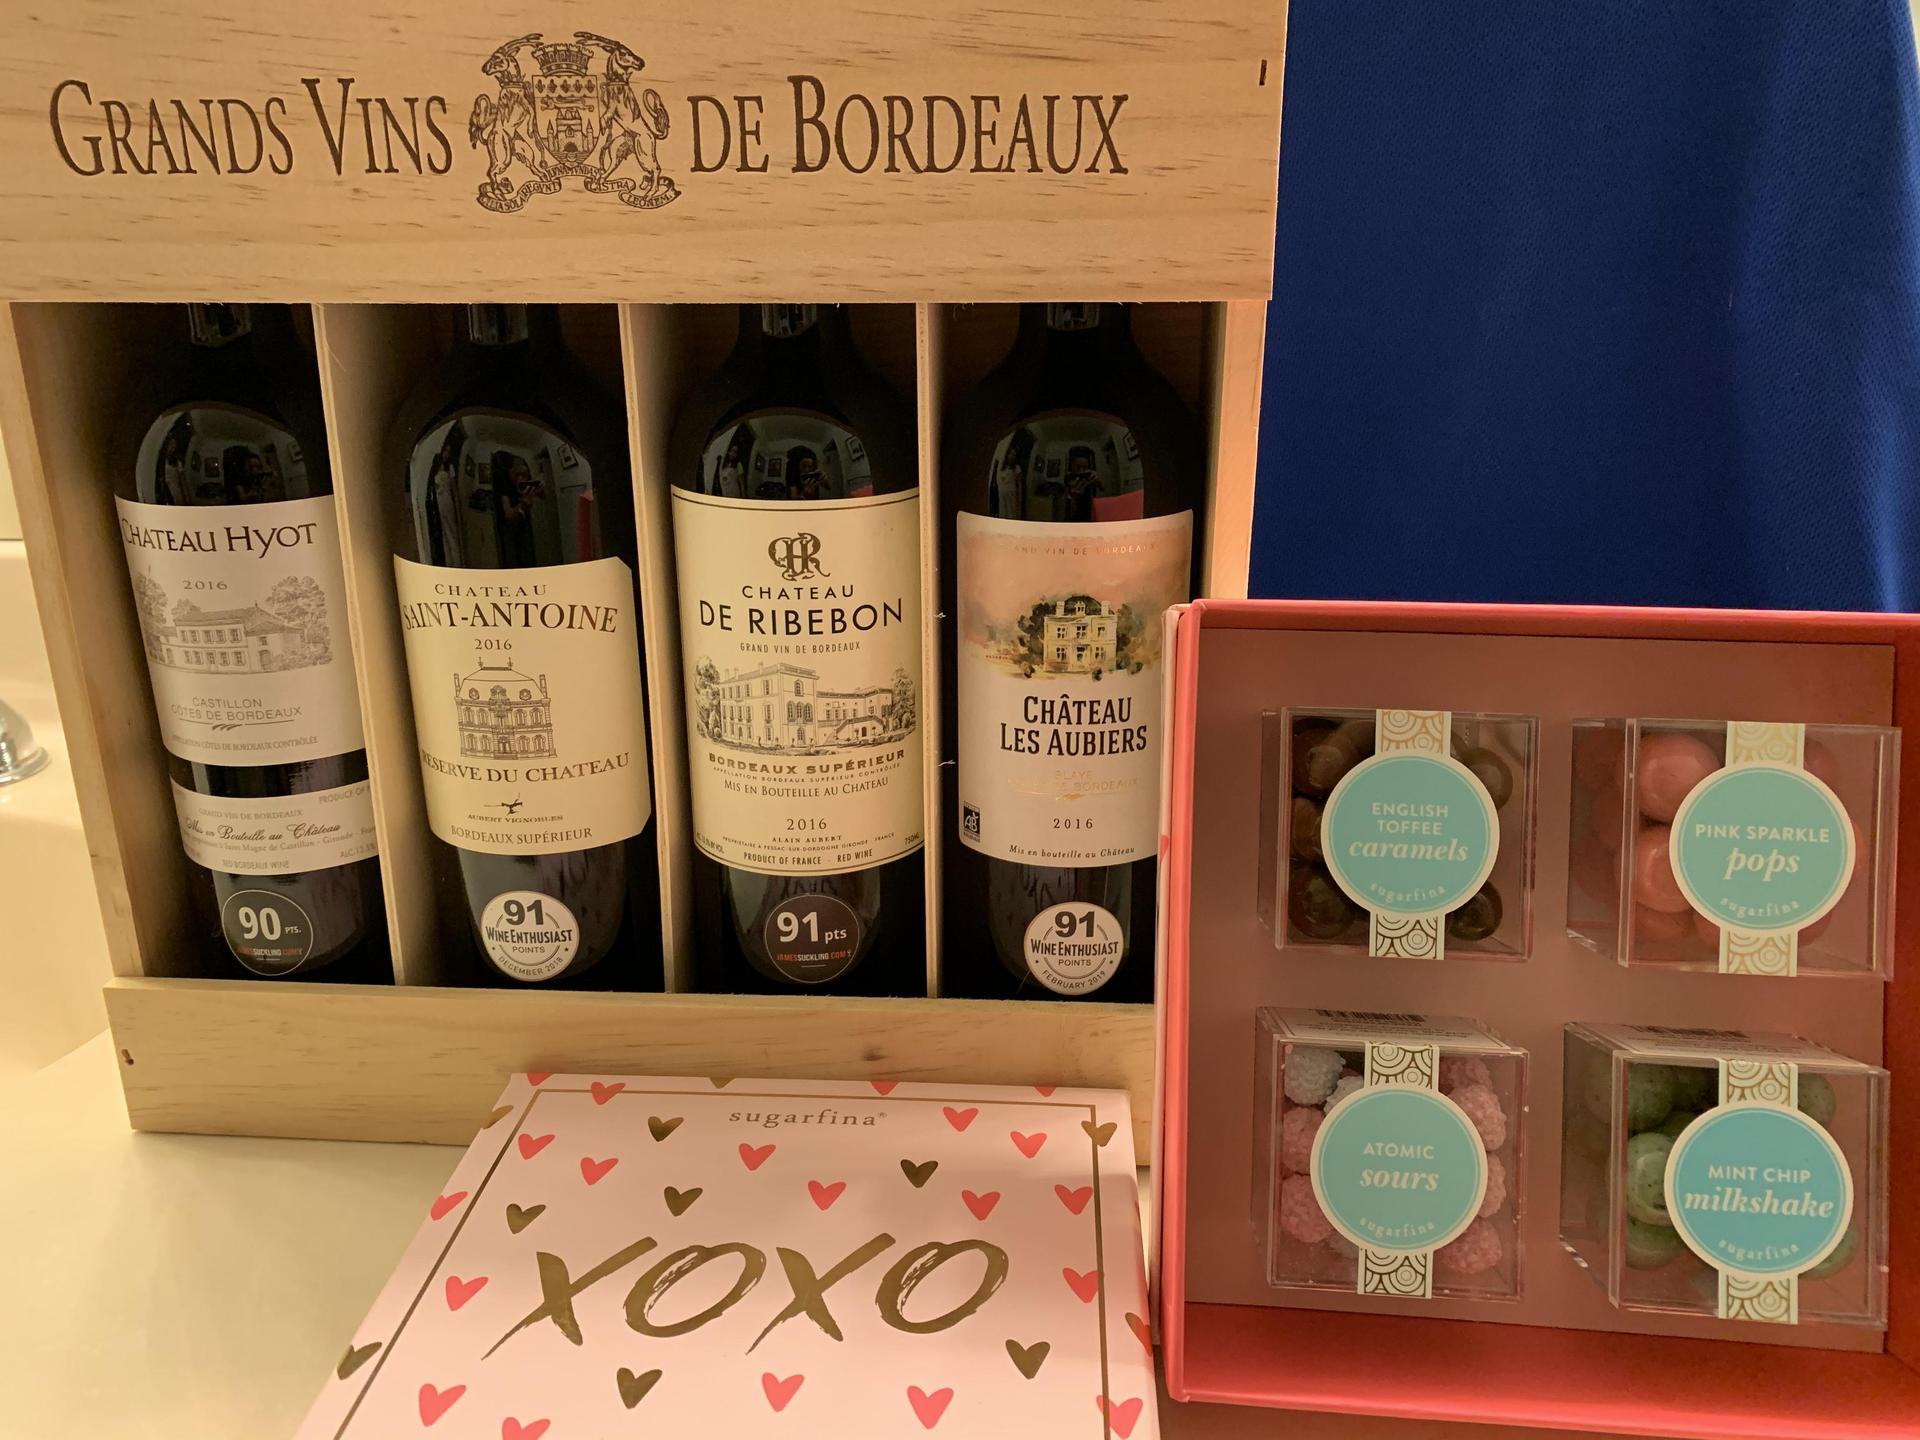 Bordeaux wine & Sugarfina